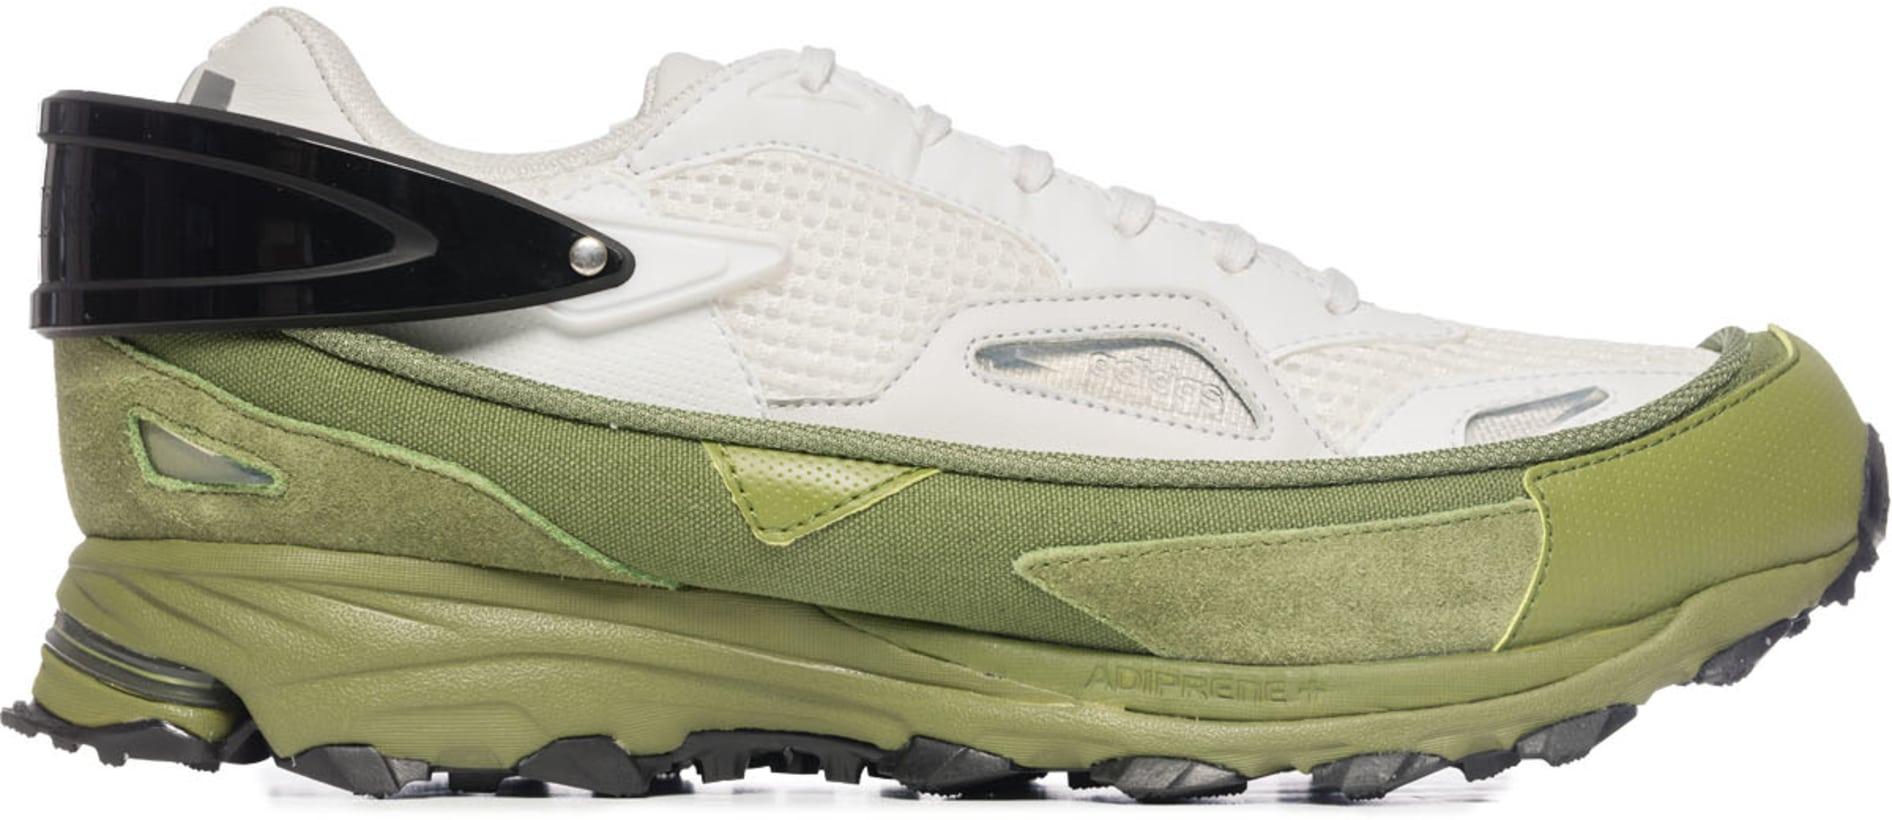 79e3fb47585a76 adidas by Raf Simons: Response Trail Sneakers - White/Black/Green ...